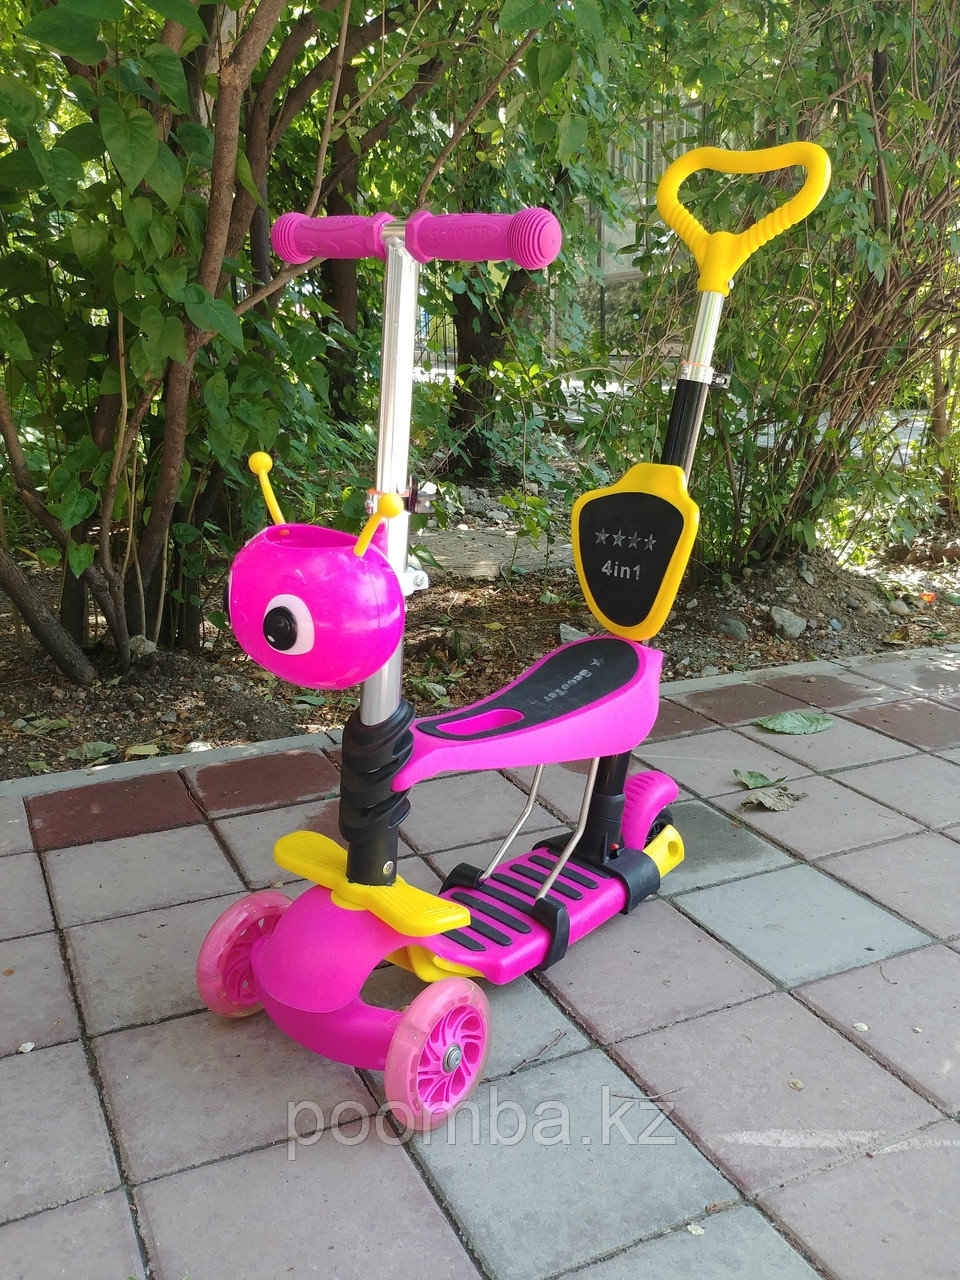 Детский Самокат 4 в 1, на 3х колесах, розовый